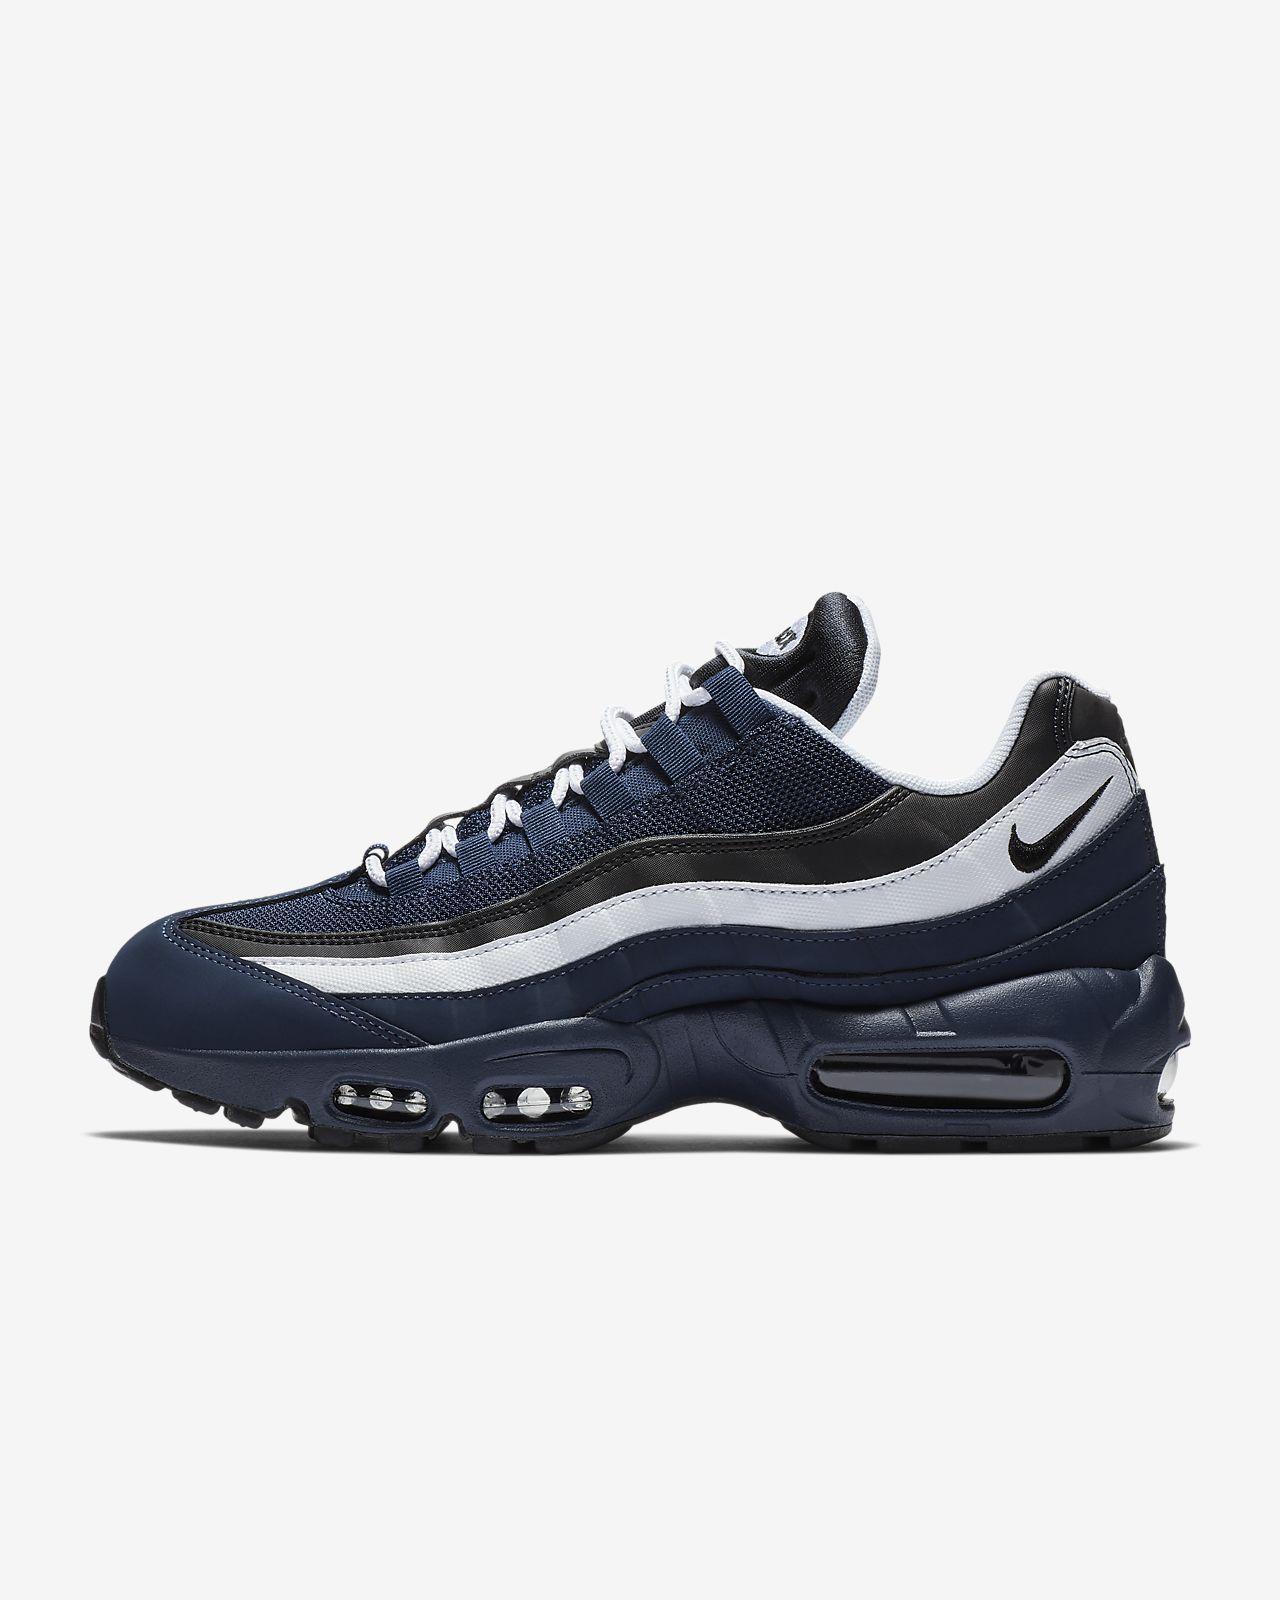 in stock 1339d 325d6 ... Nike Air Max 95 Essential-sko til mænd